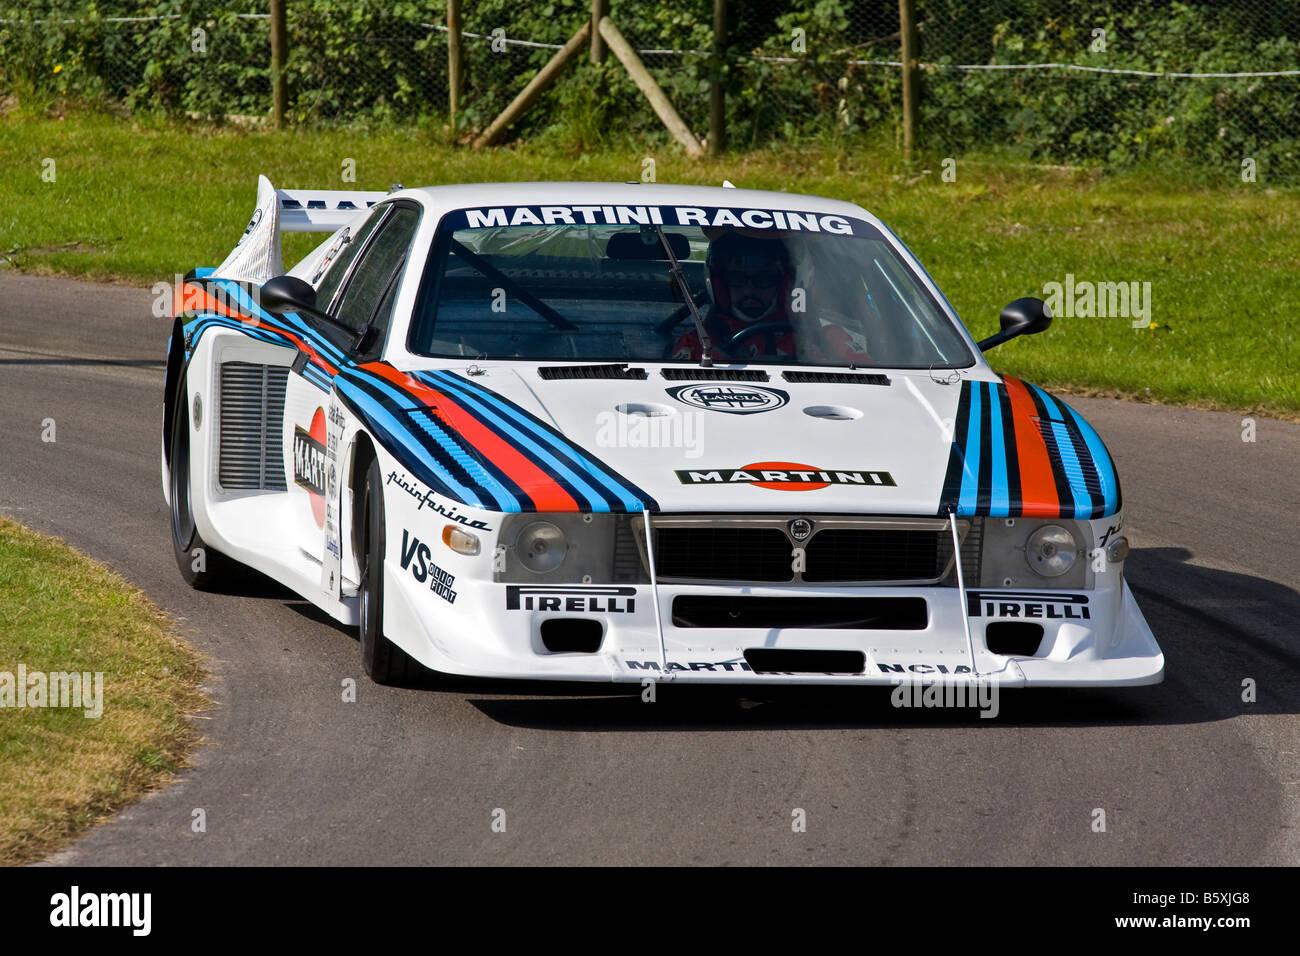 http://c7.alamy.com/comp/B5XJG8/1981-lancia-beta-montecarlo-group-5-gt-class-racer-with-driver-luigi-B5XJG8.jpg